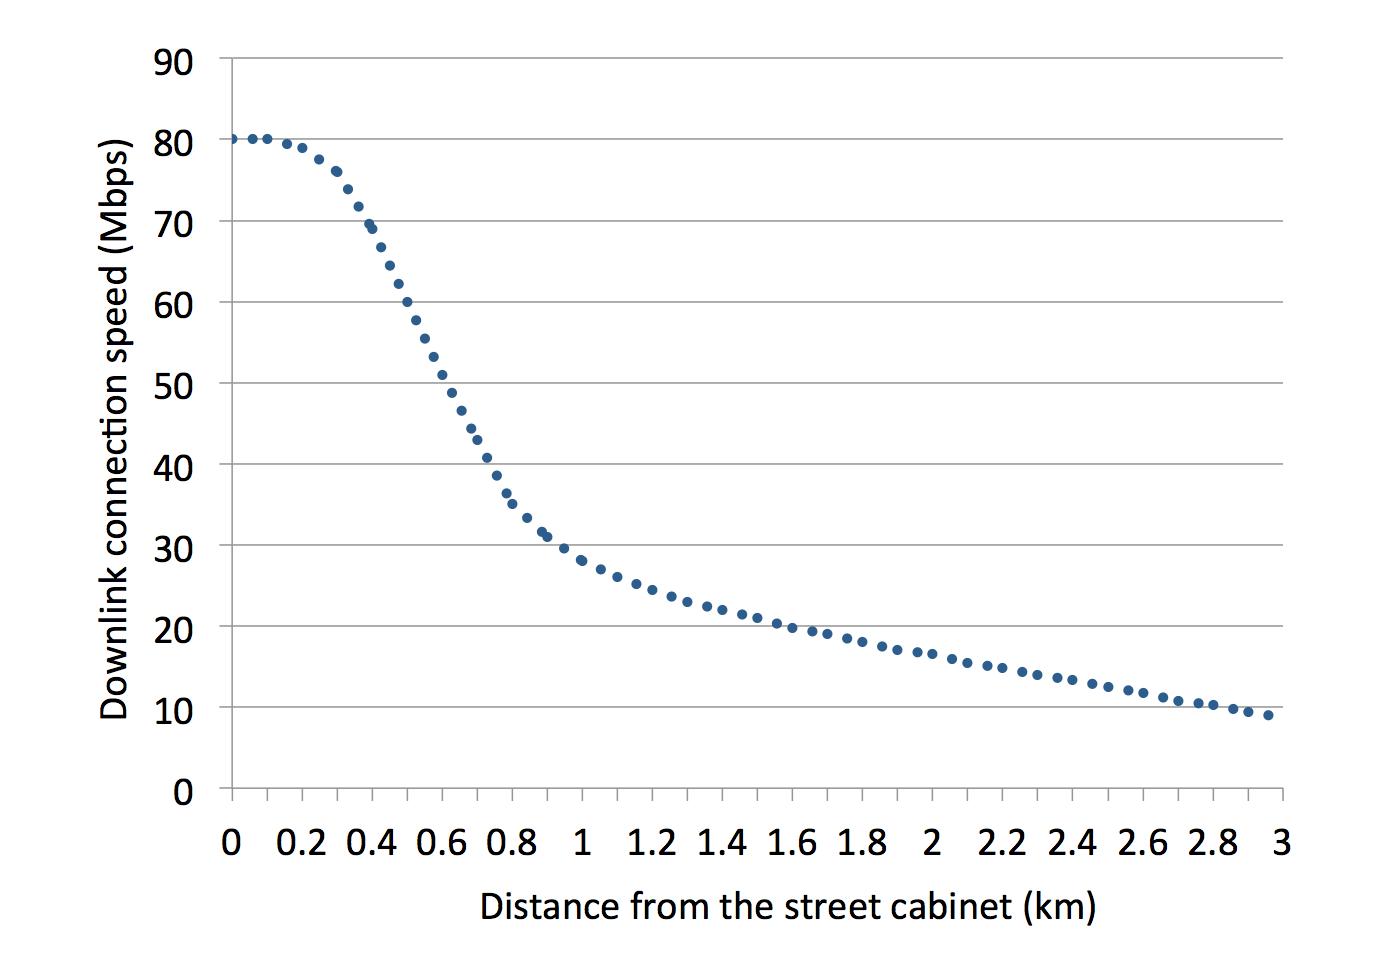 bt vdsl wiring diagram 2007 international 4300 transmission vdsl2 fttc speed vs distance increase broadband graph of versus from the street cabinet